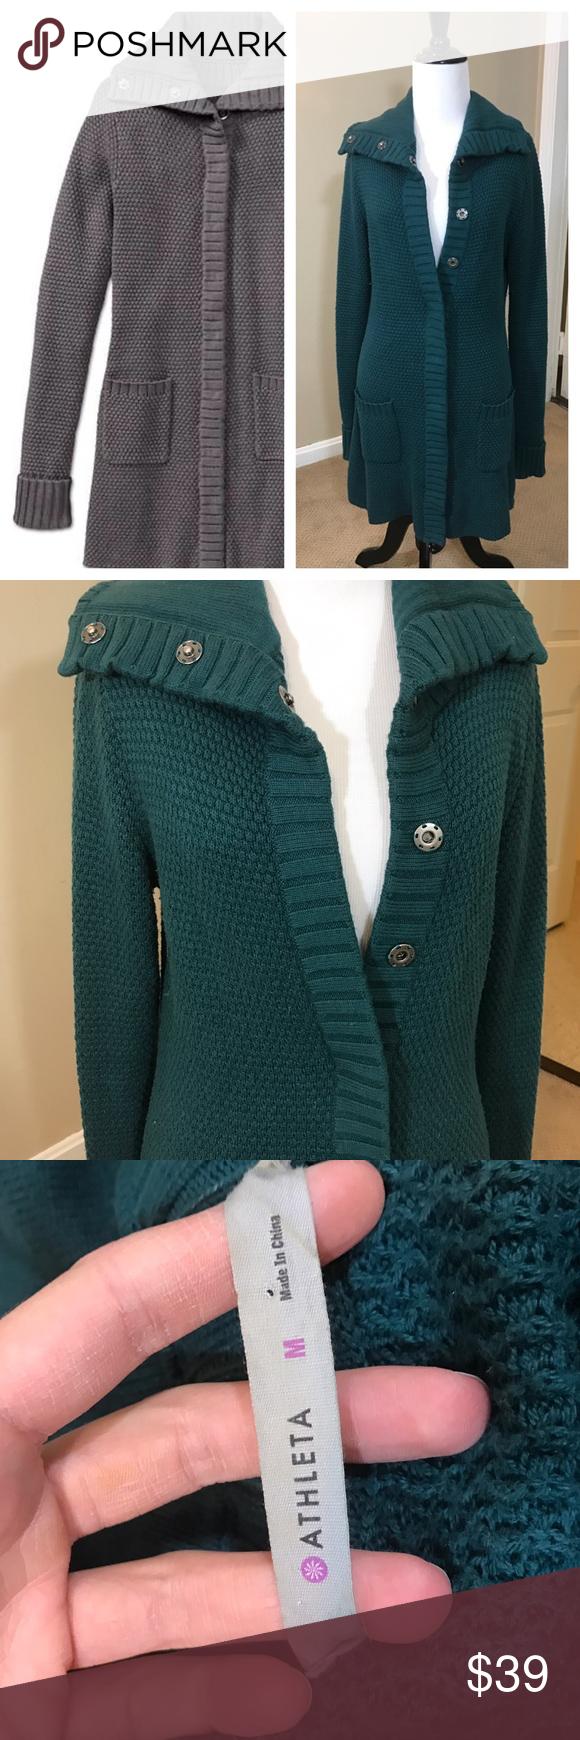 Athleta 'Sula' Long Sweater Coat Snap Front Athleta Sula sweater ...